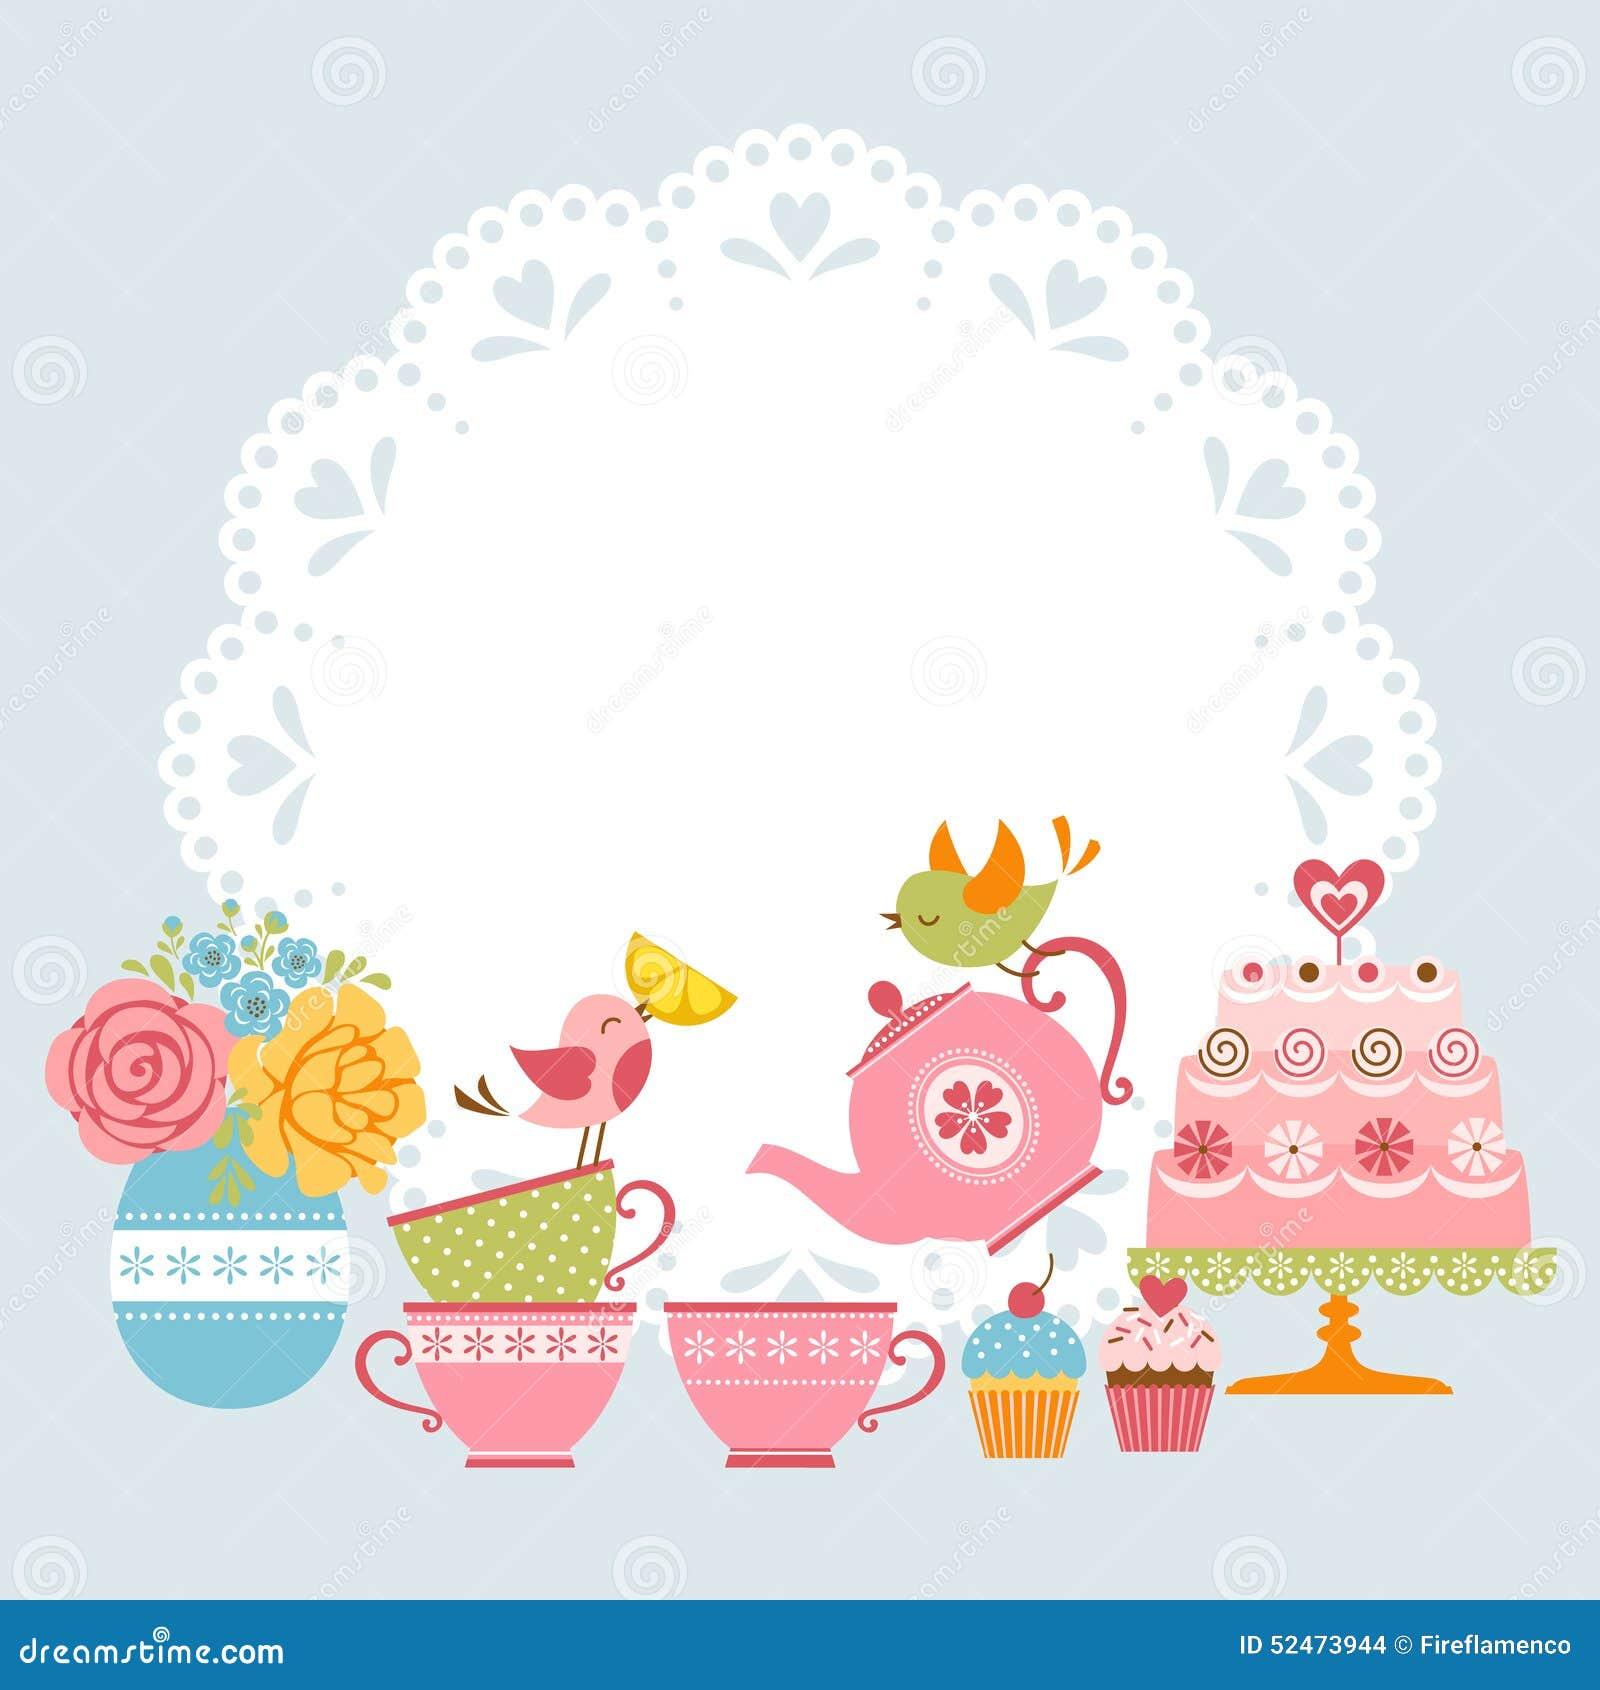 clipart tea party invitation - photo #28